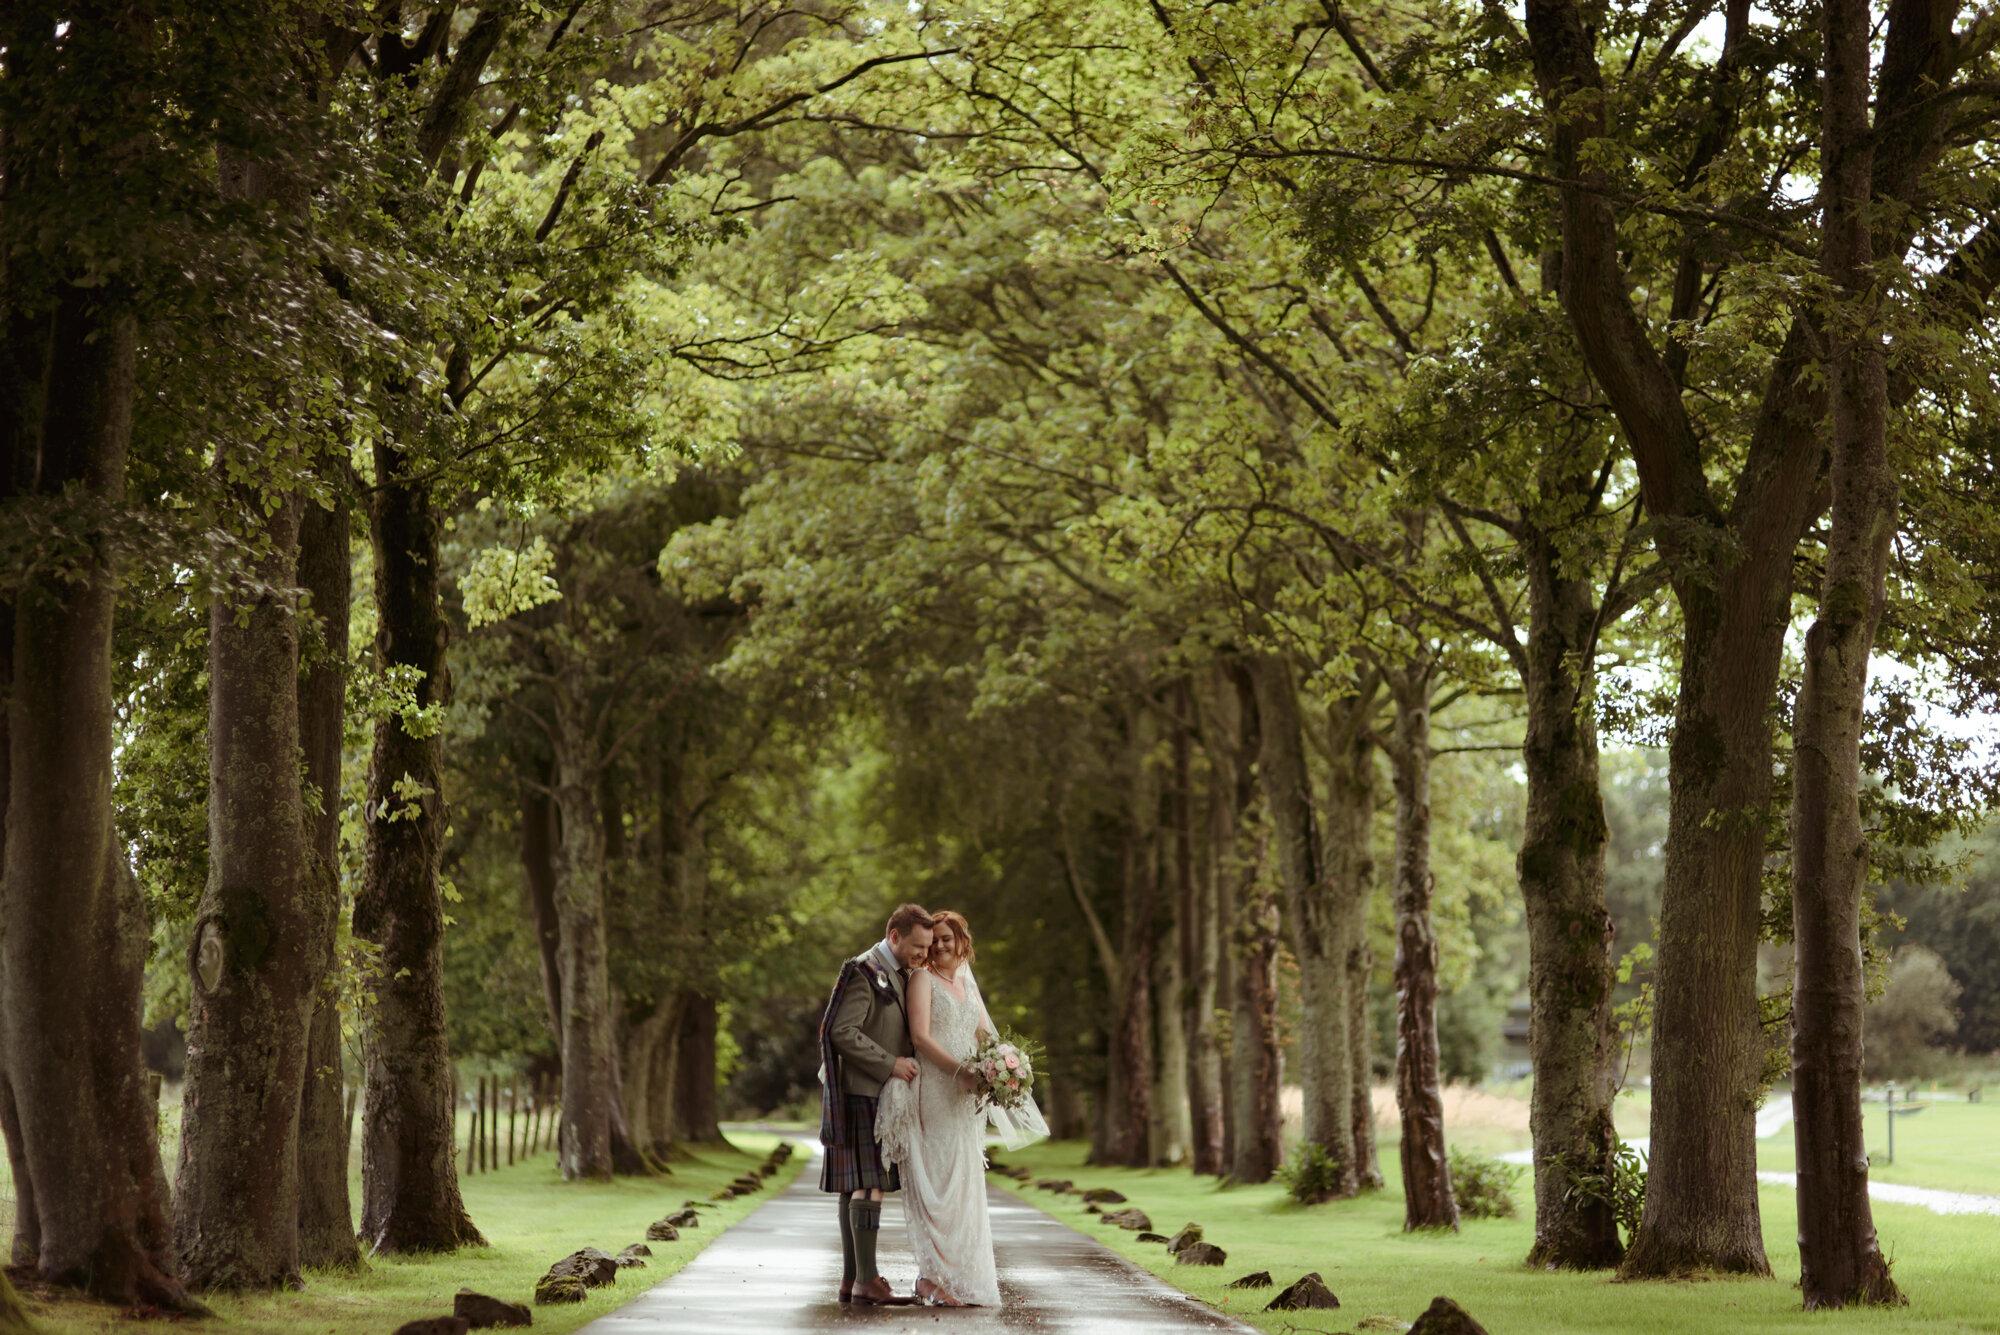 glenbervie-wedding-photography-natural.jpg